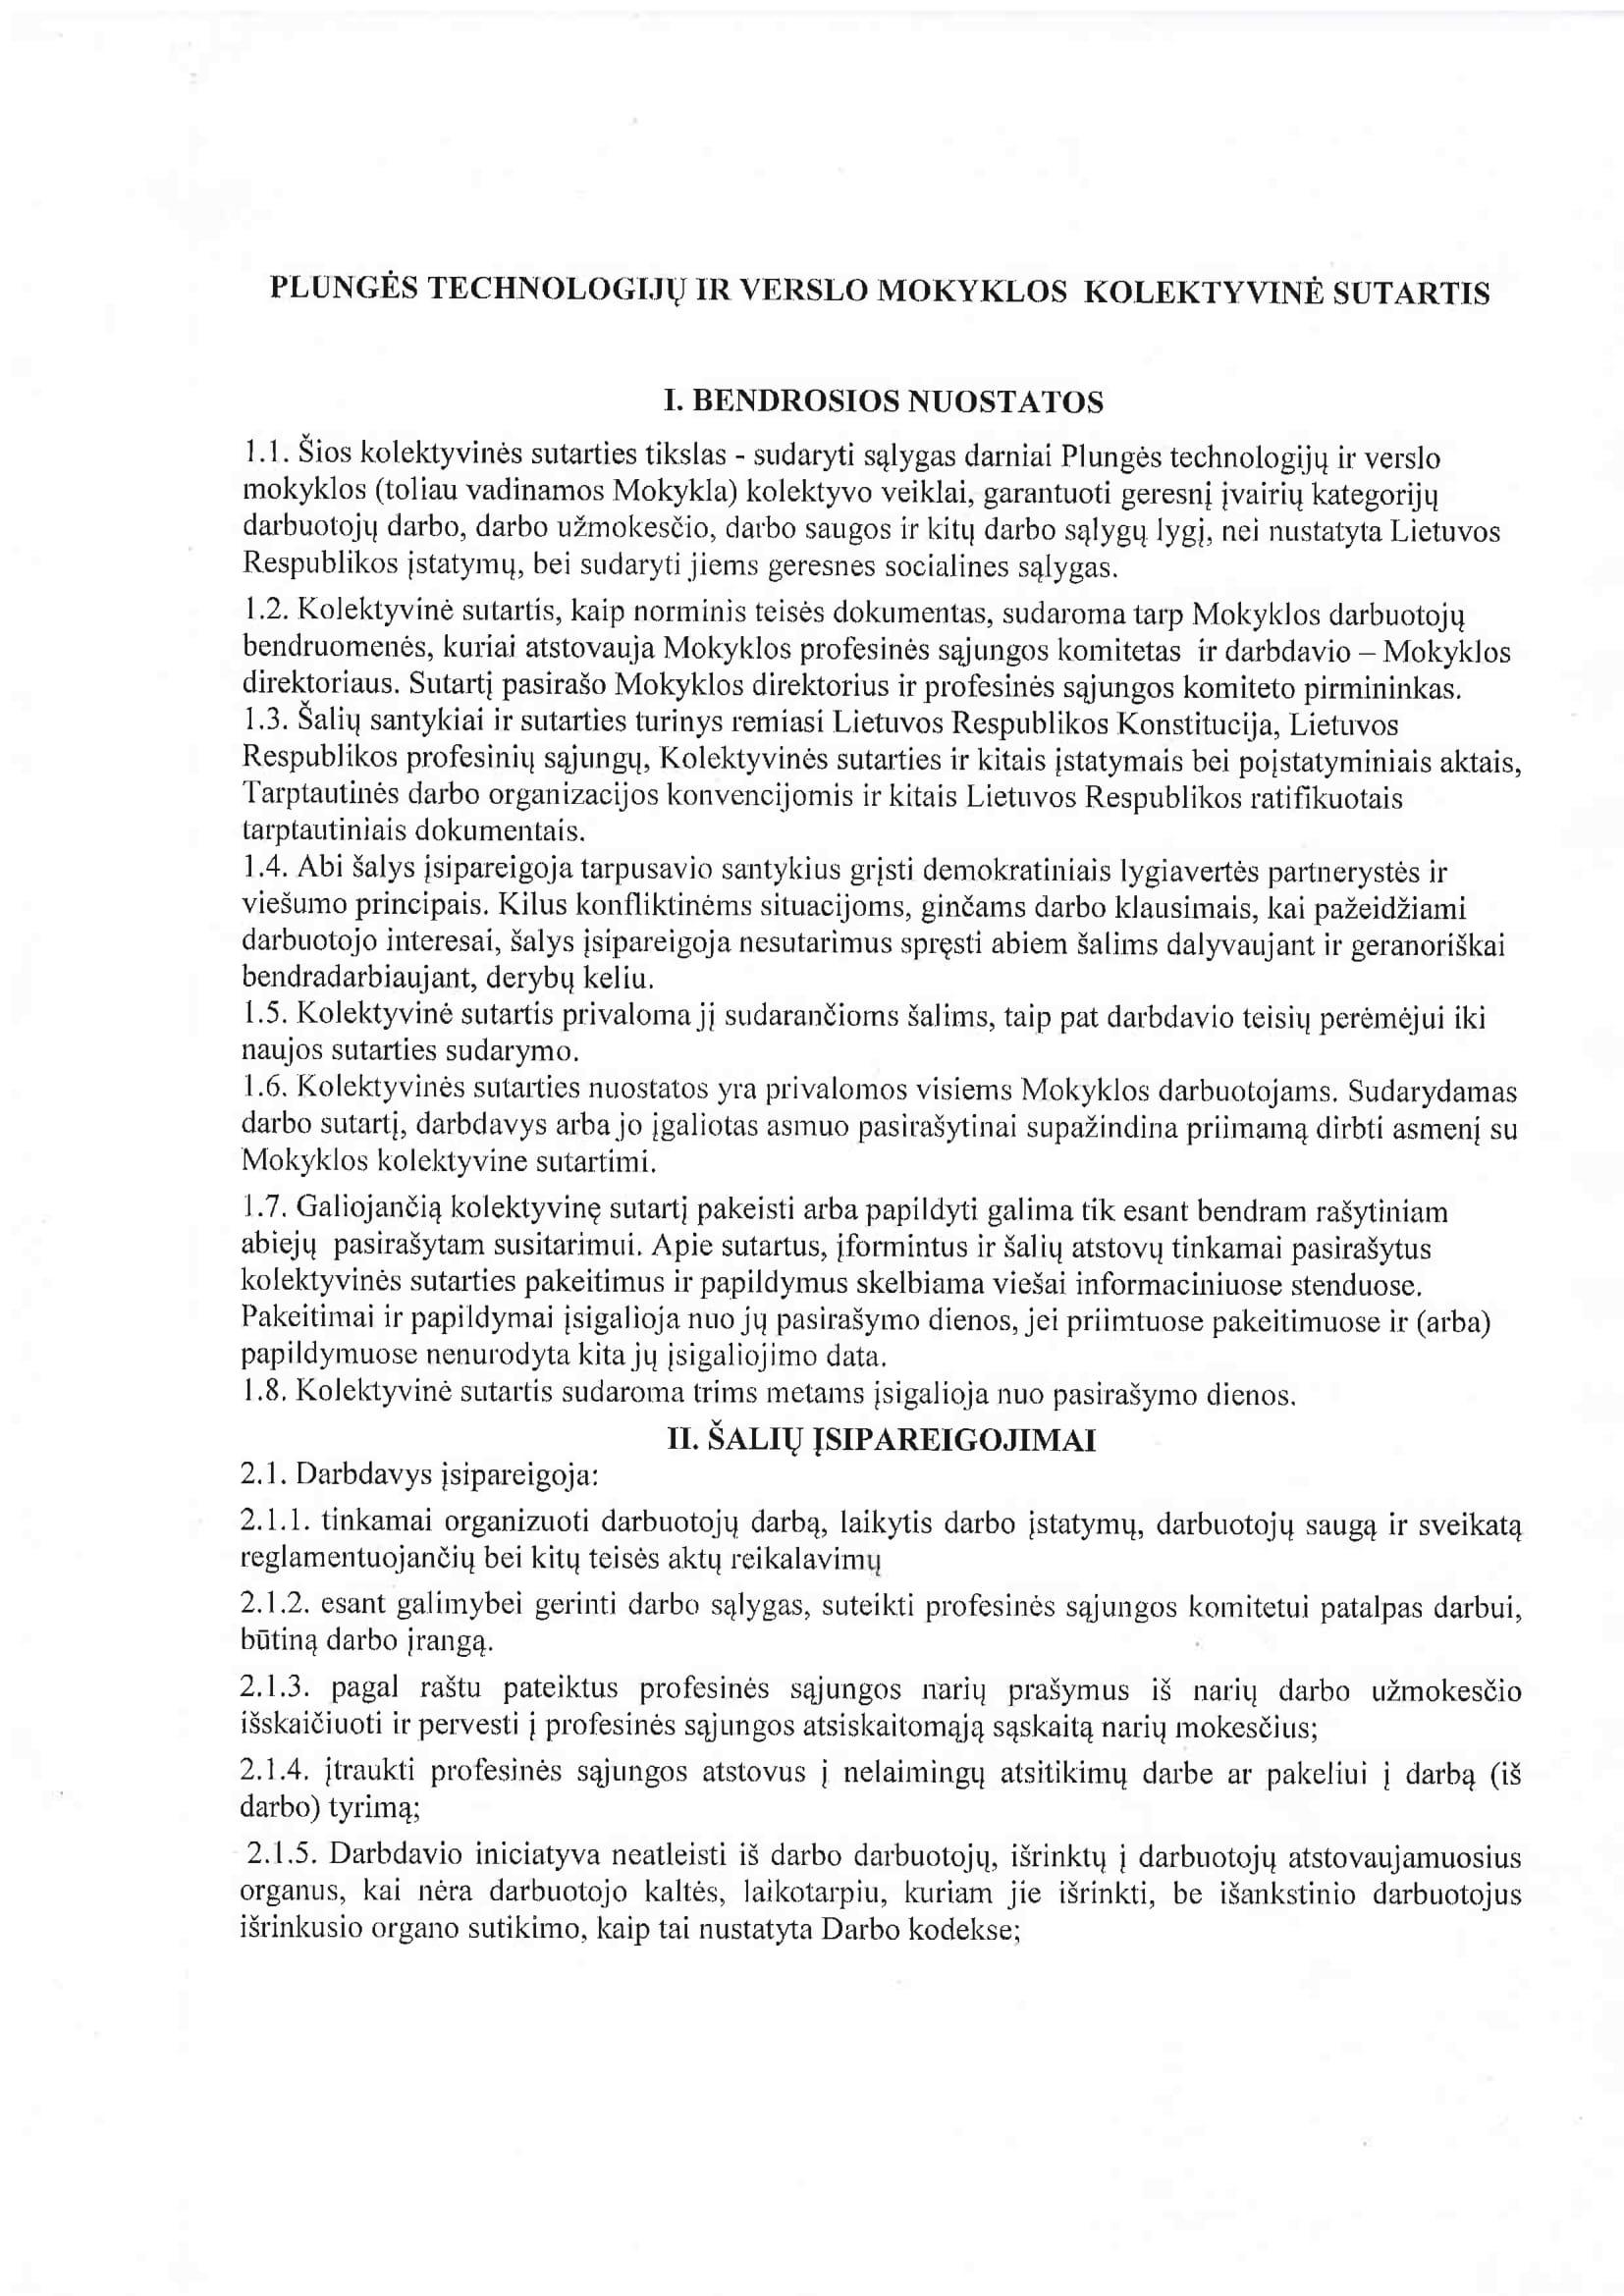 kolektyvine_sutartis-1